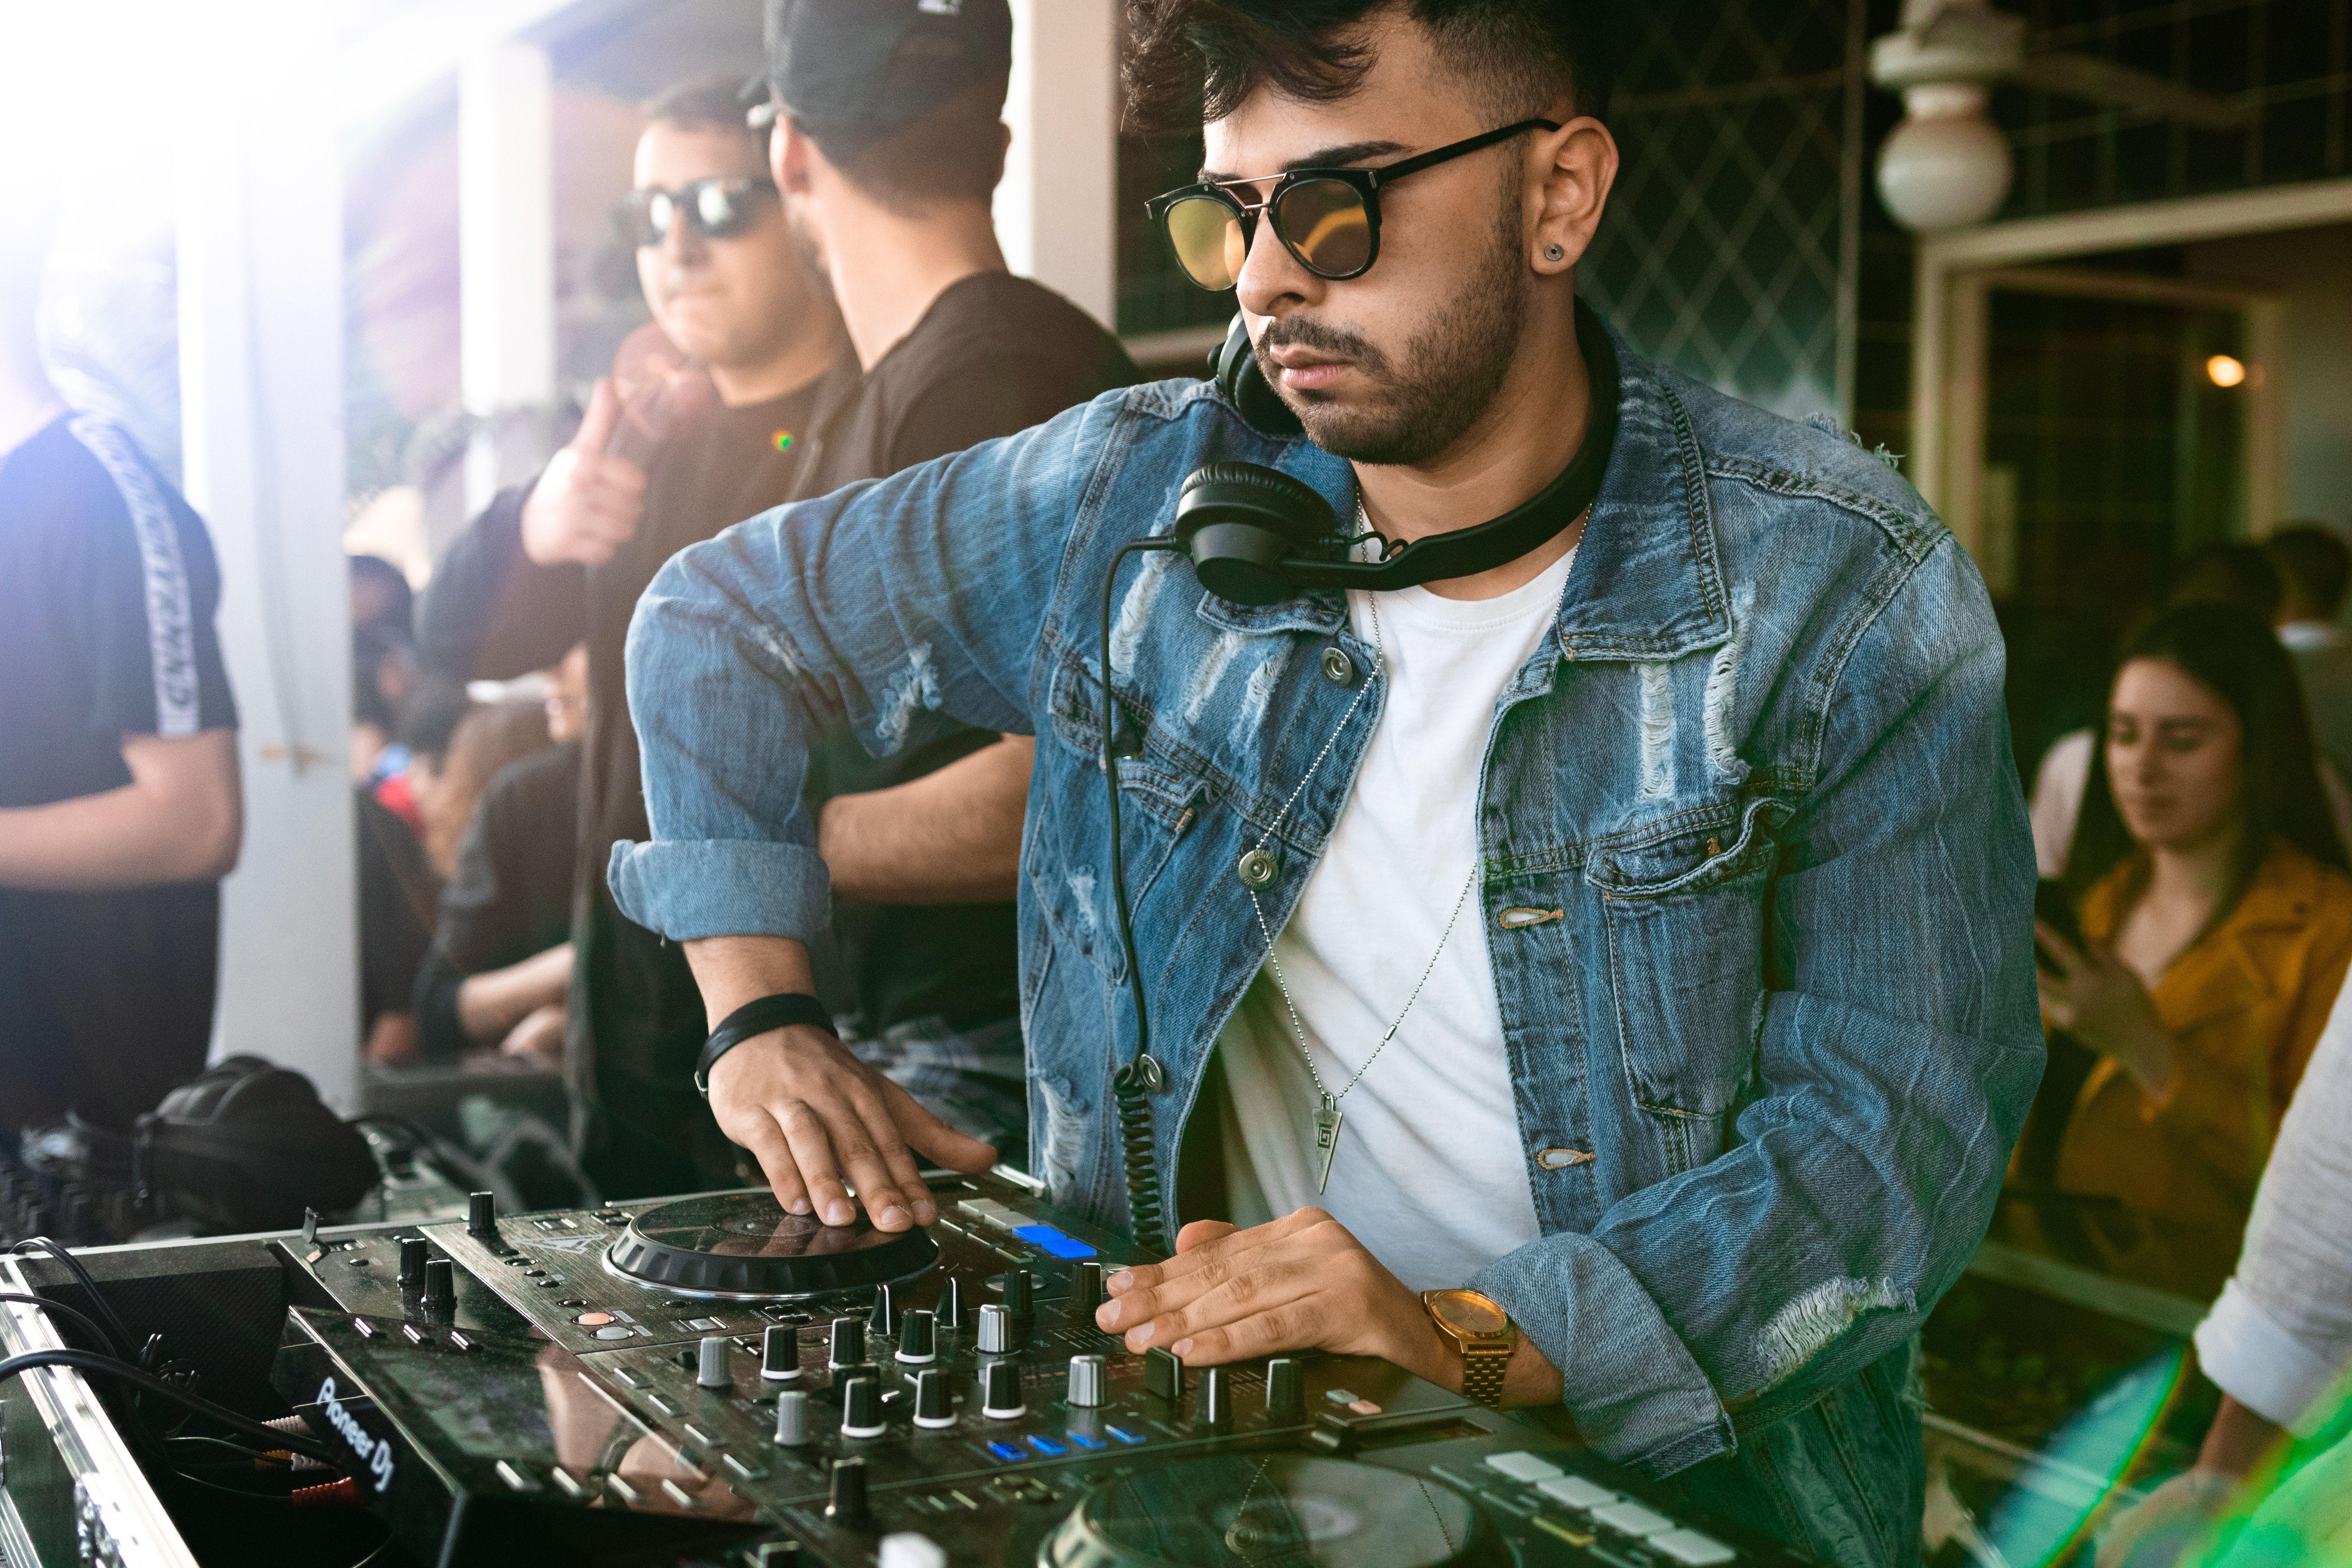 The 11 Best DJ Equipment Items of 2019